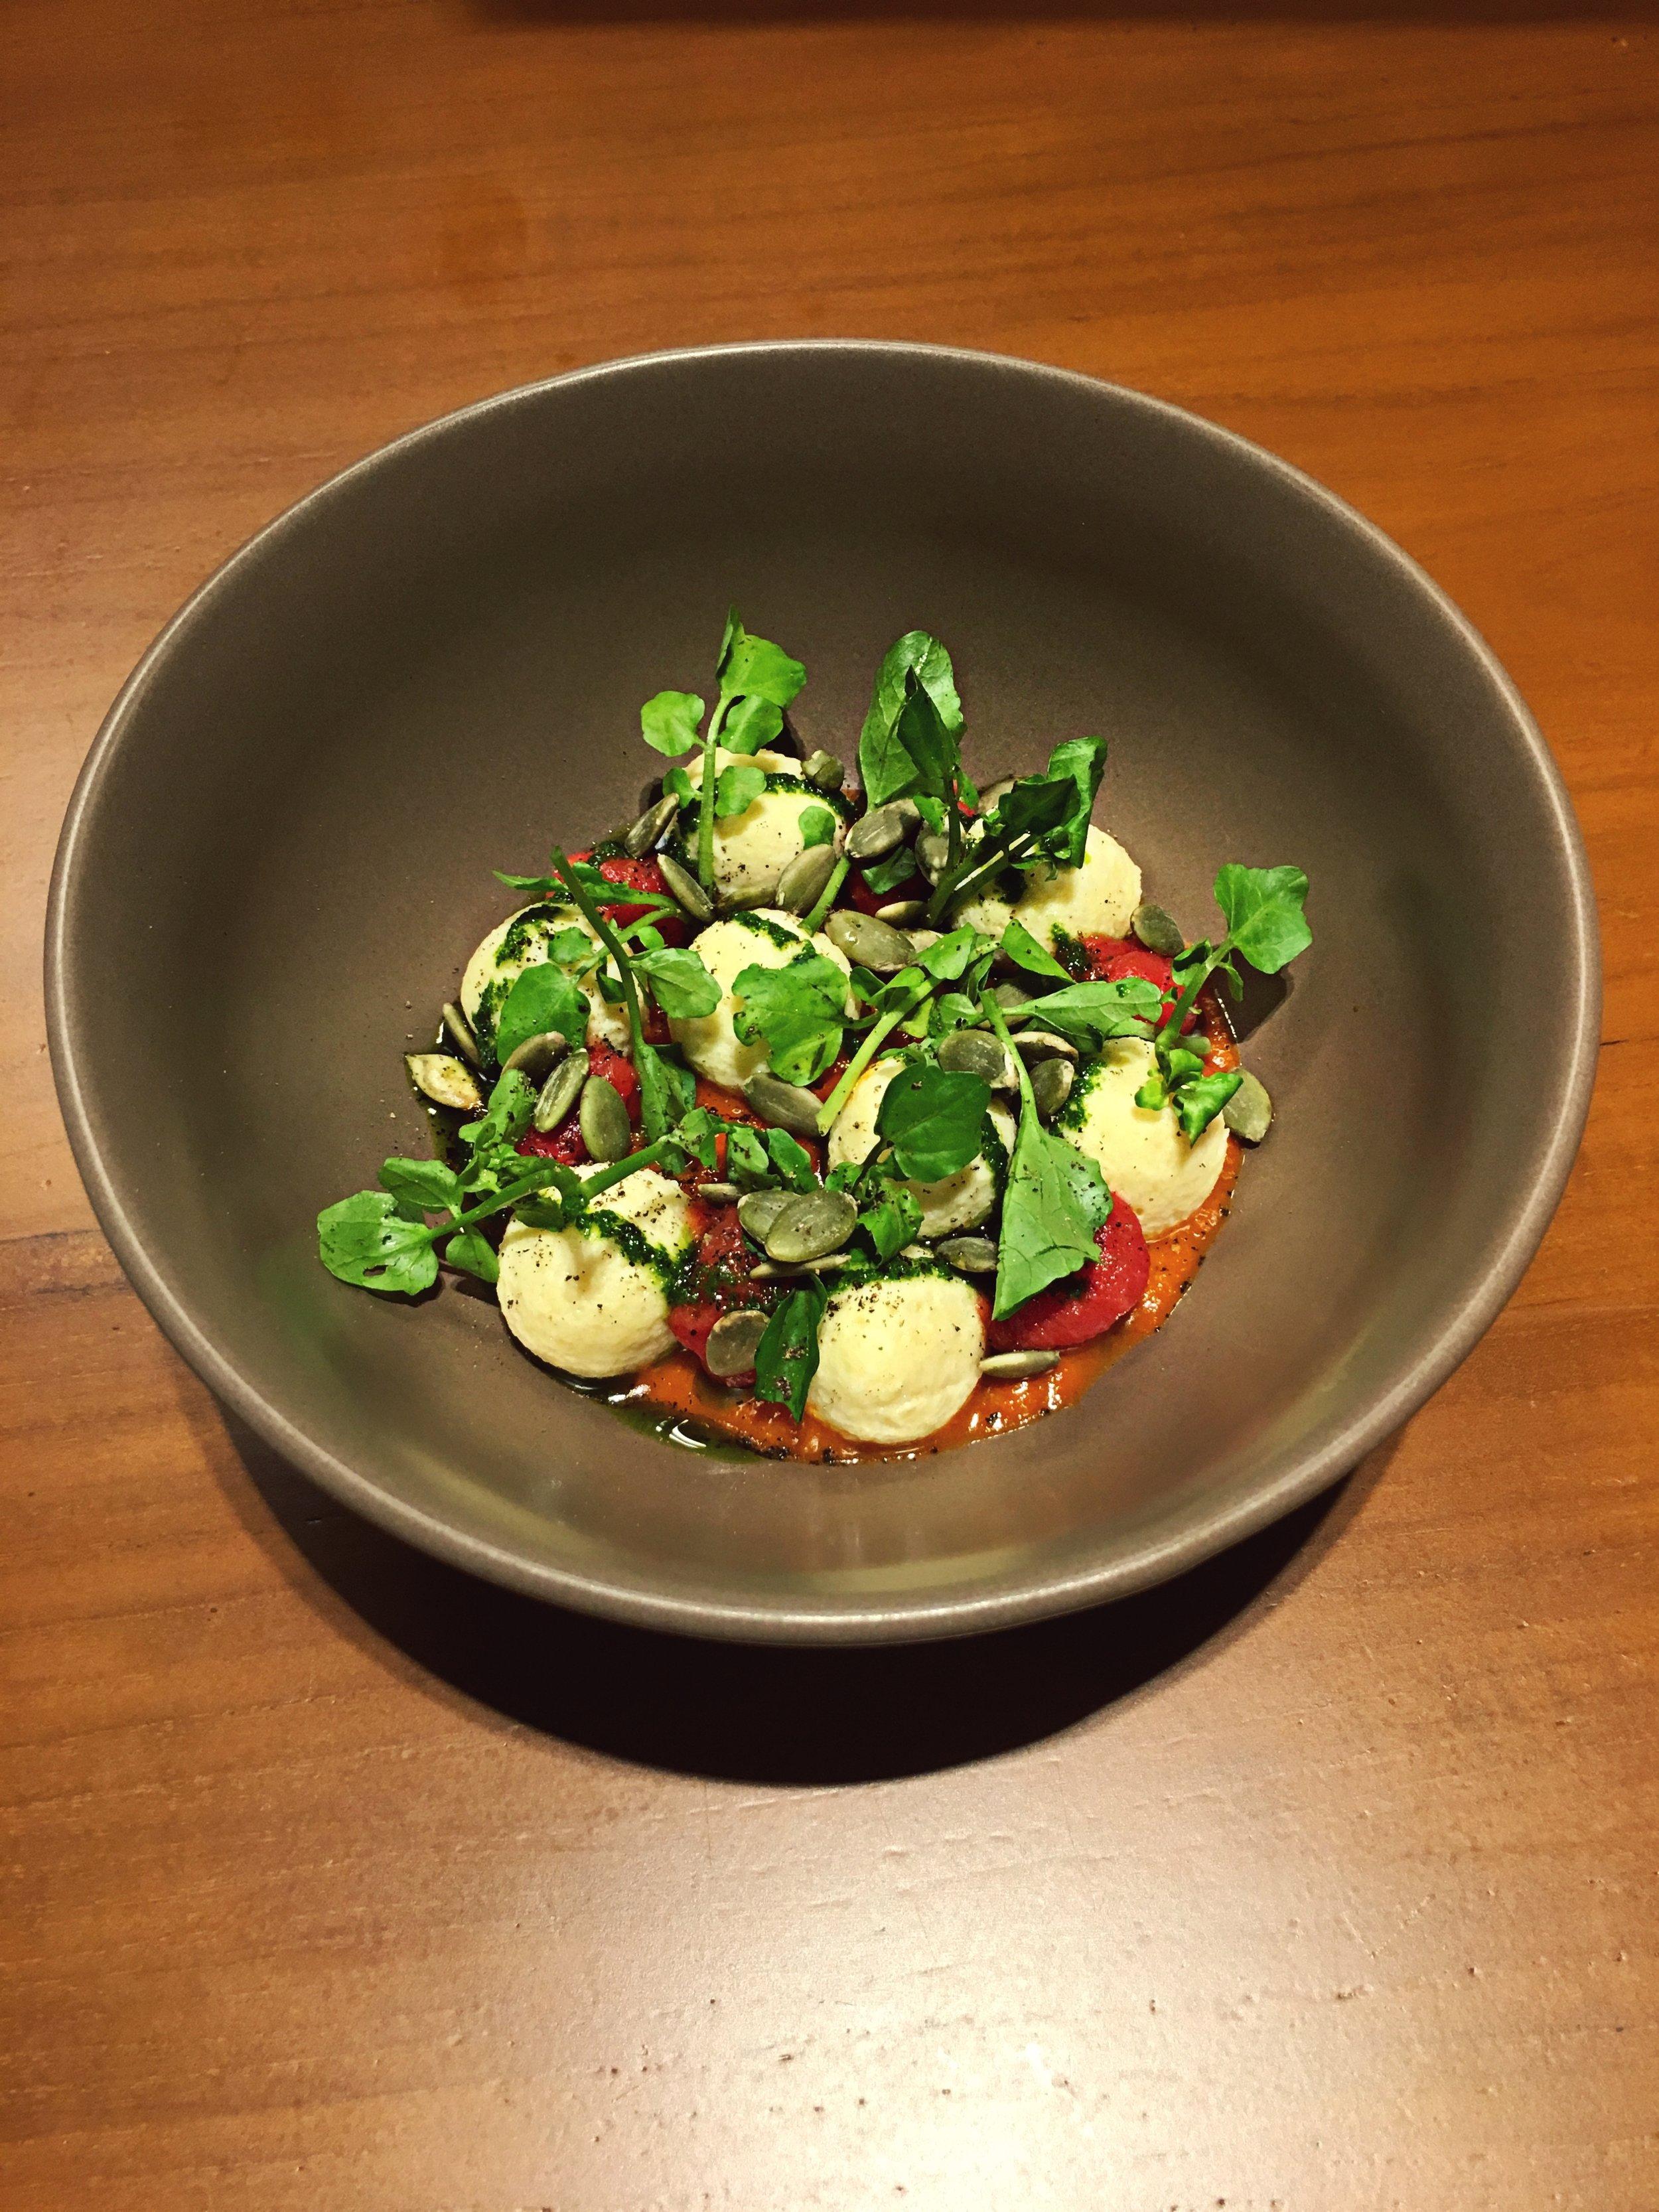 Ricotta Gnocchi - ▽ Cheese dumplings▽ Roasted Watermelon▽ Sun-dried tomato pesto❤ Top 3 favorite dishes